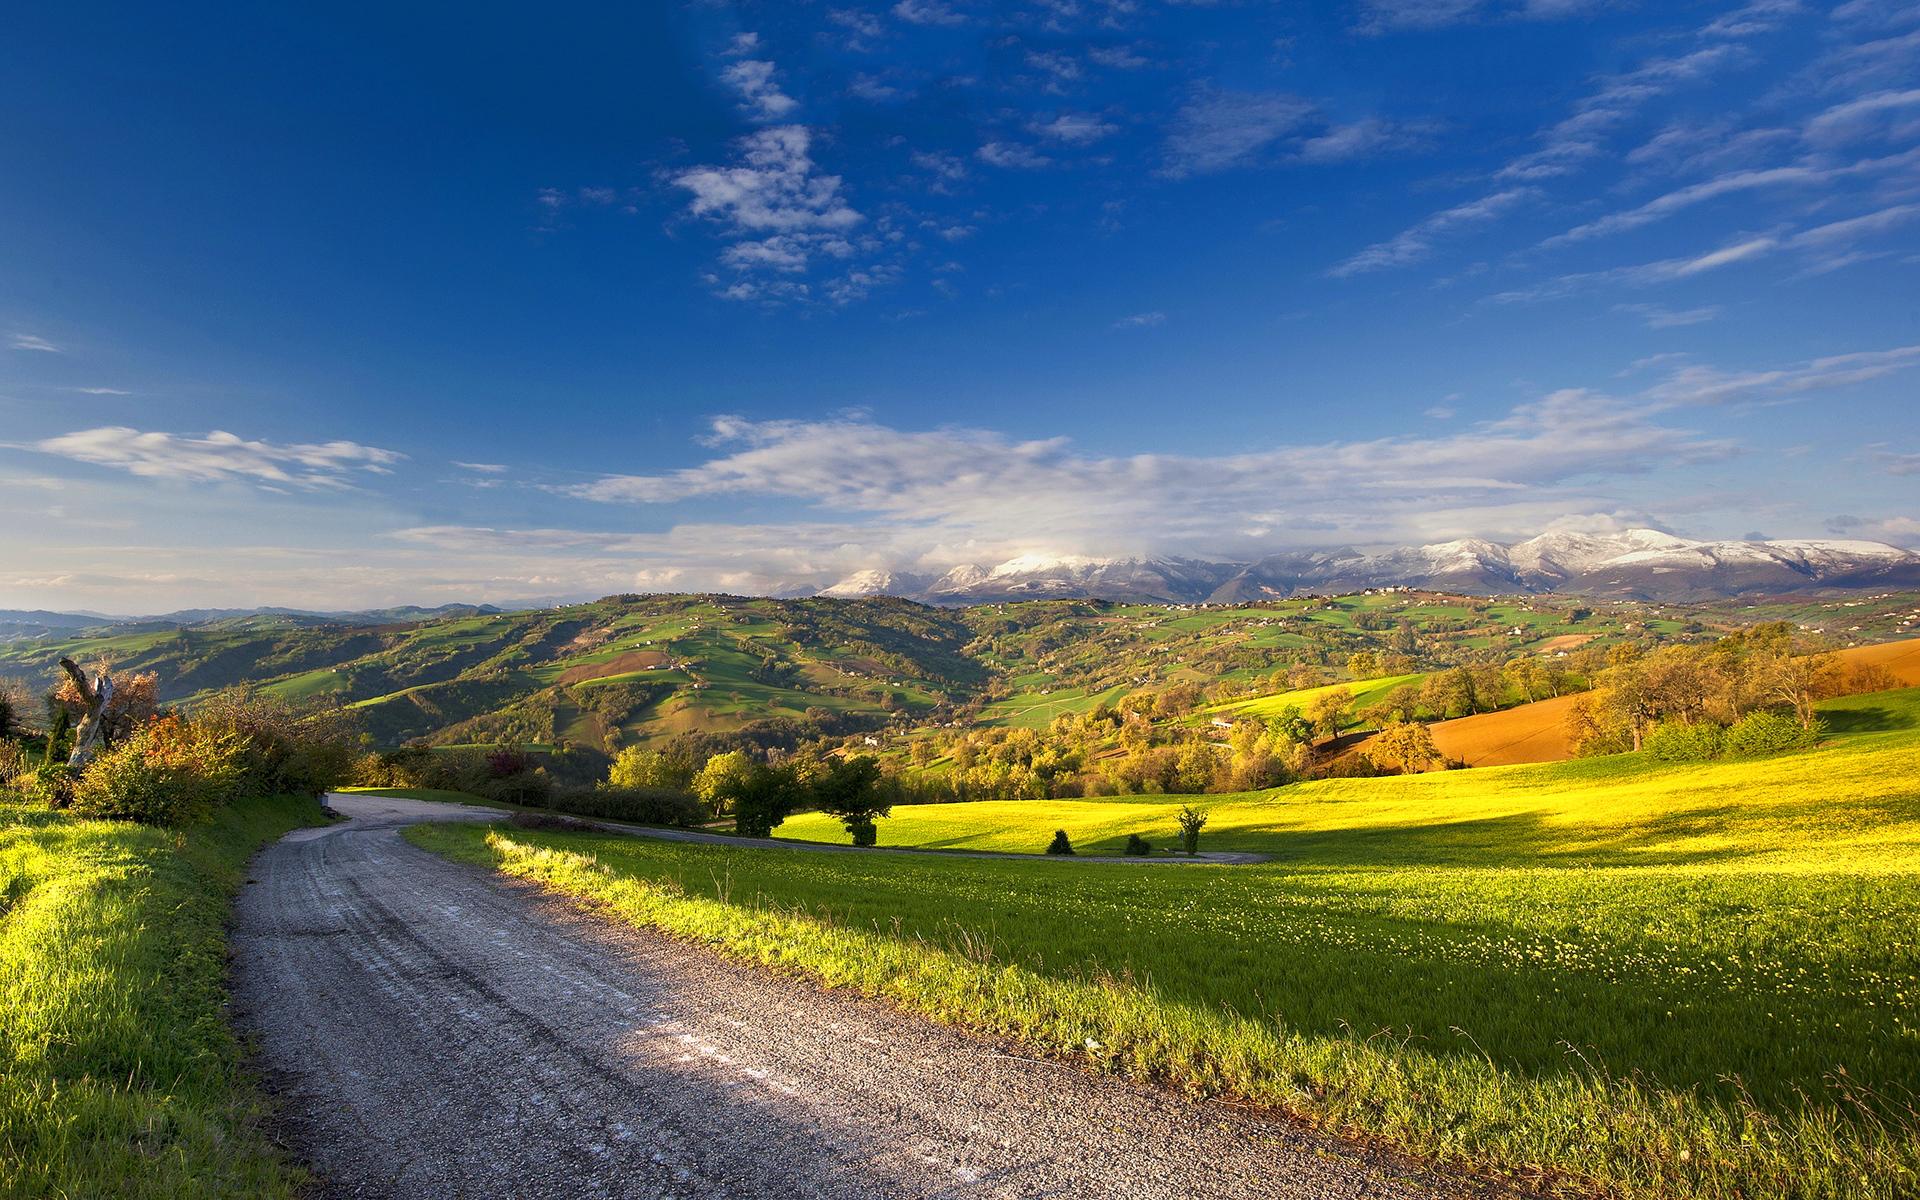 ... summer-landscape-road-hd ...